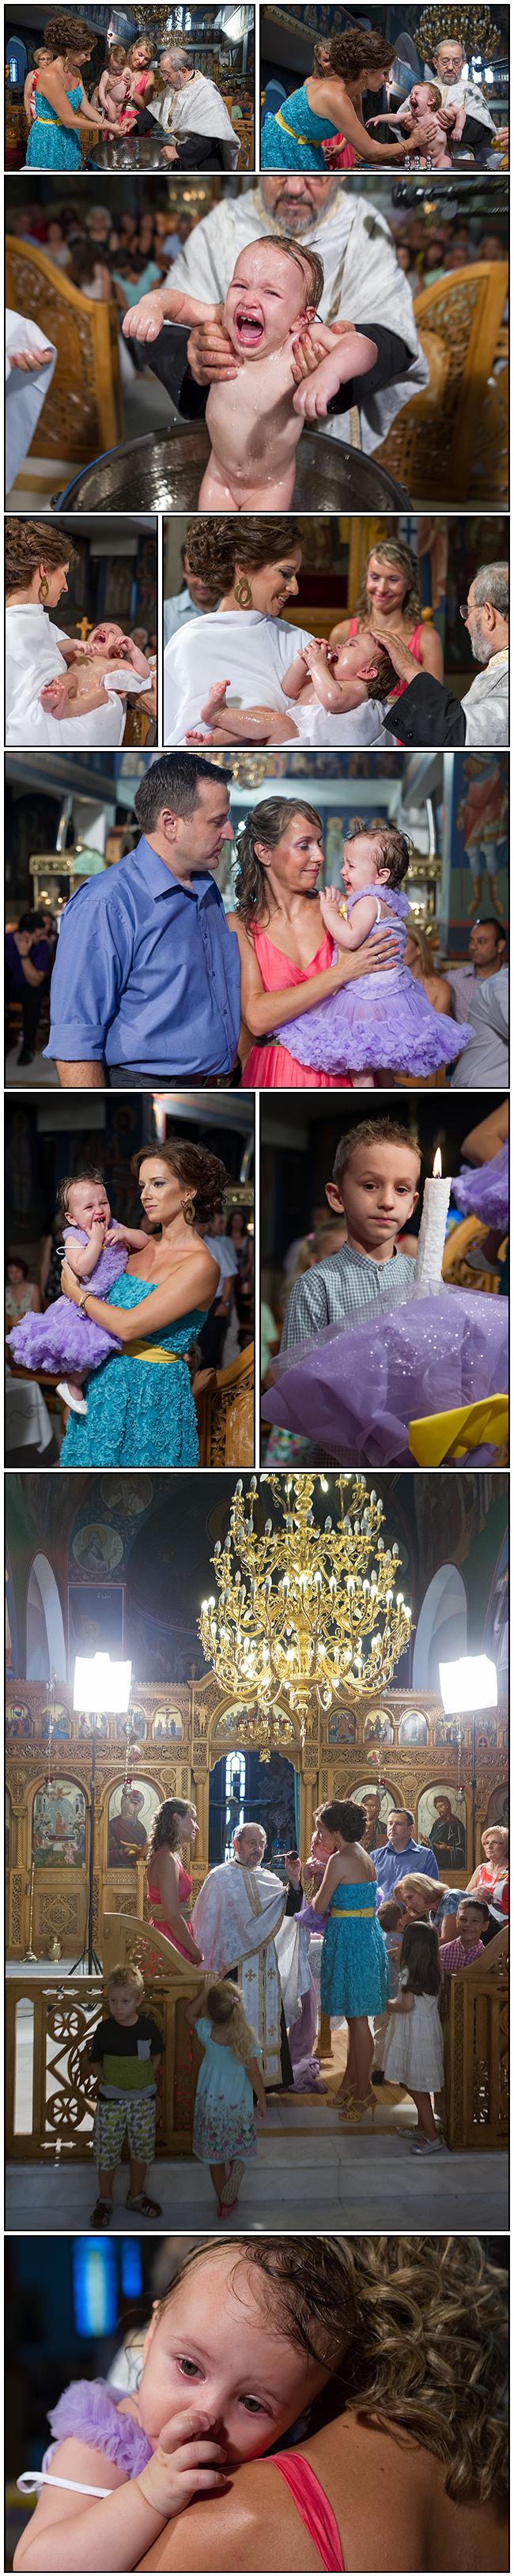 Mirto baptism 2